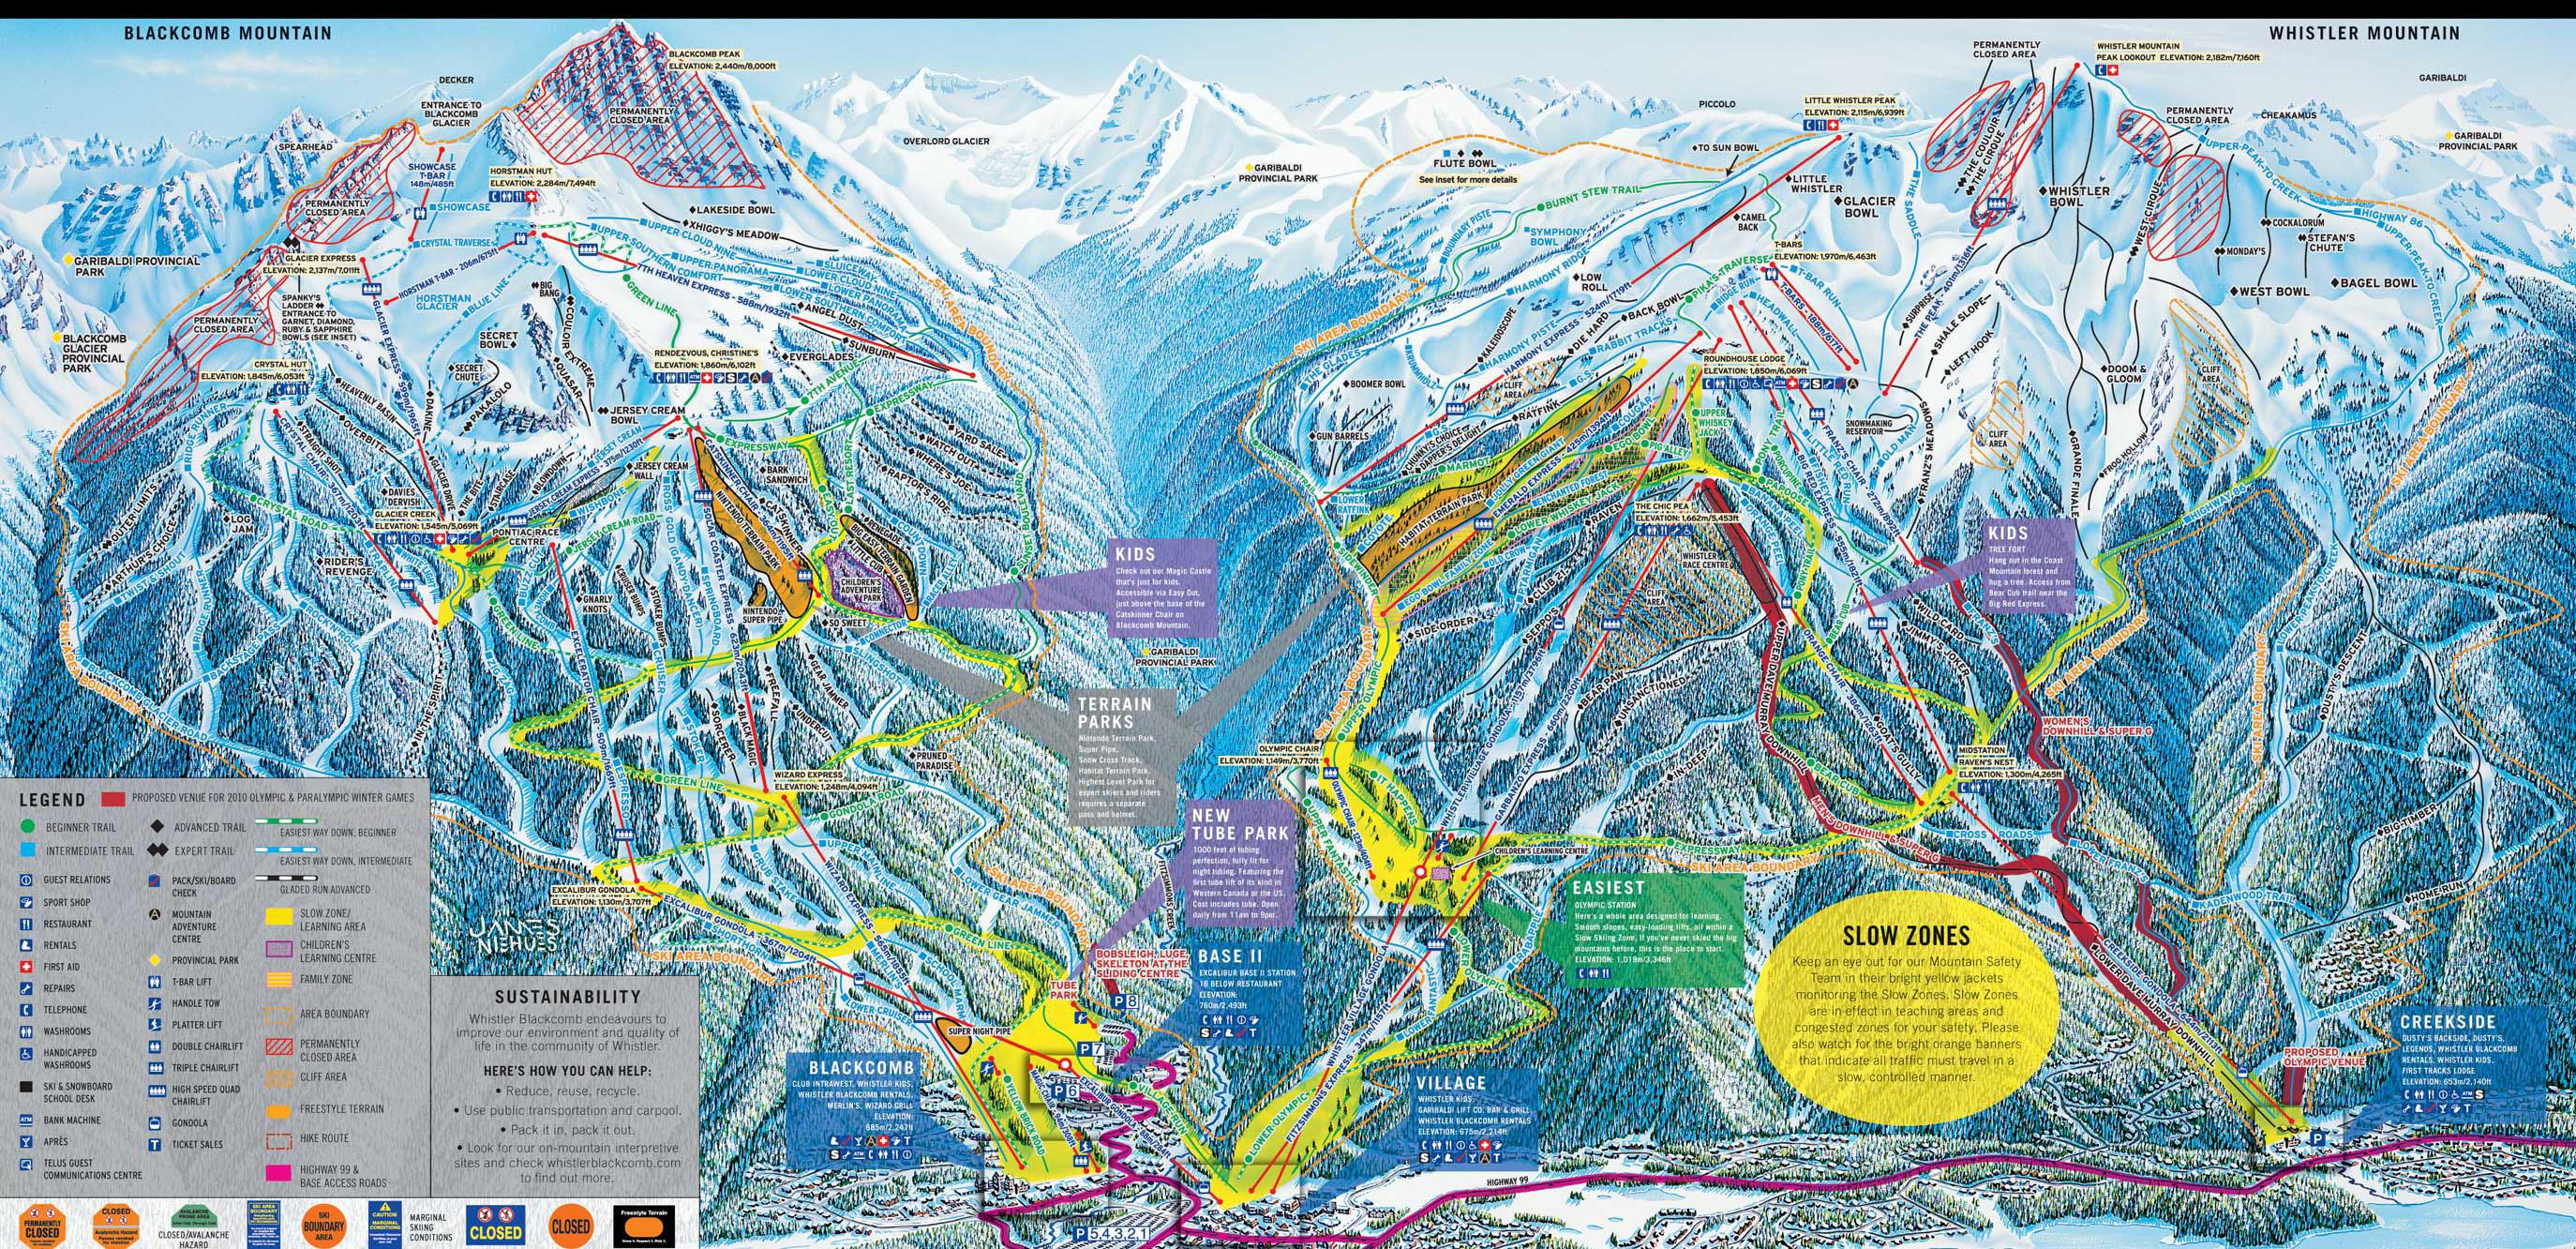 Okchalets Premium Mountain Accommodations